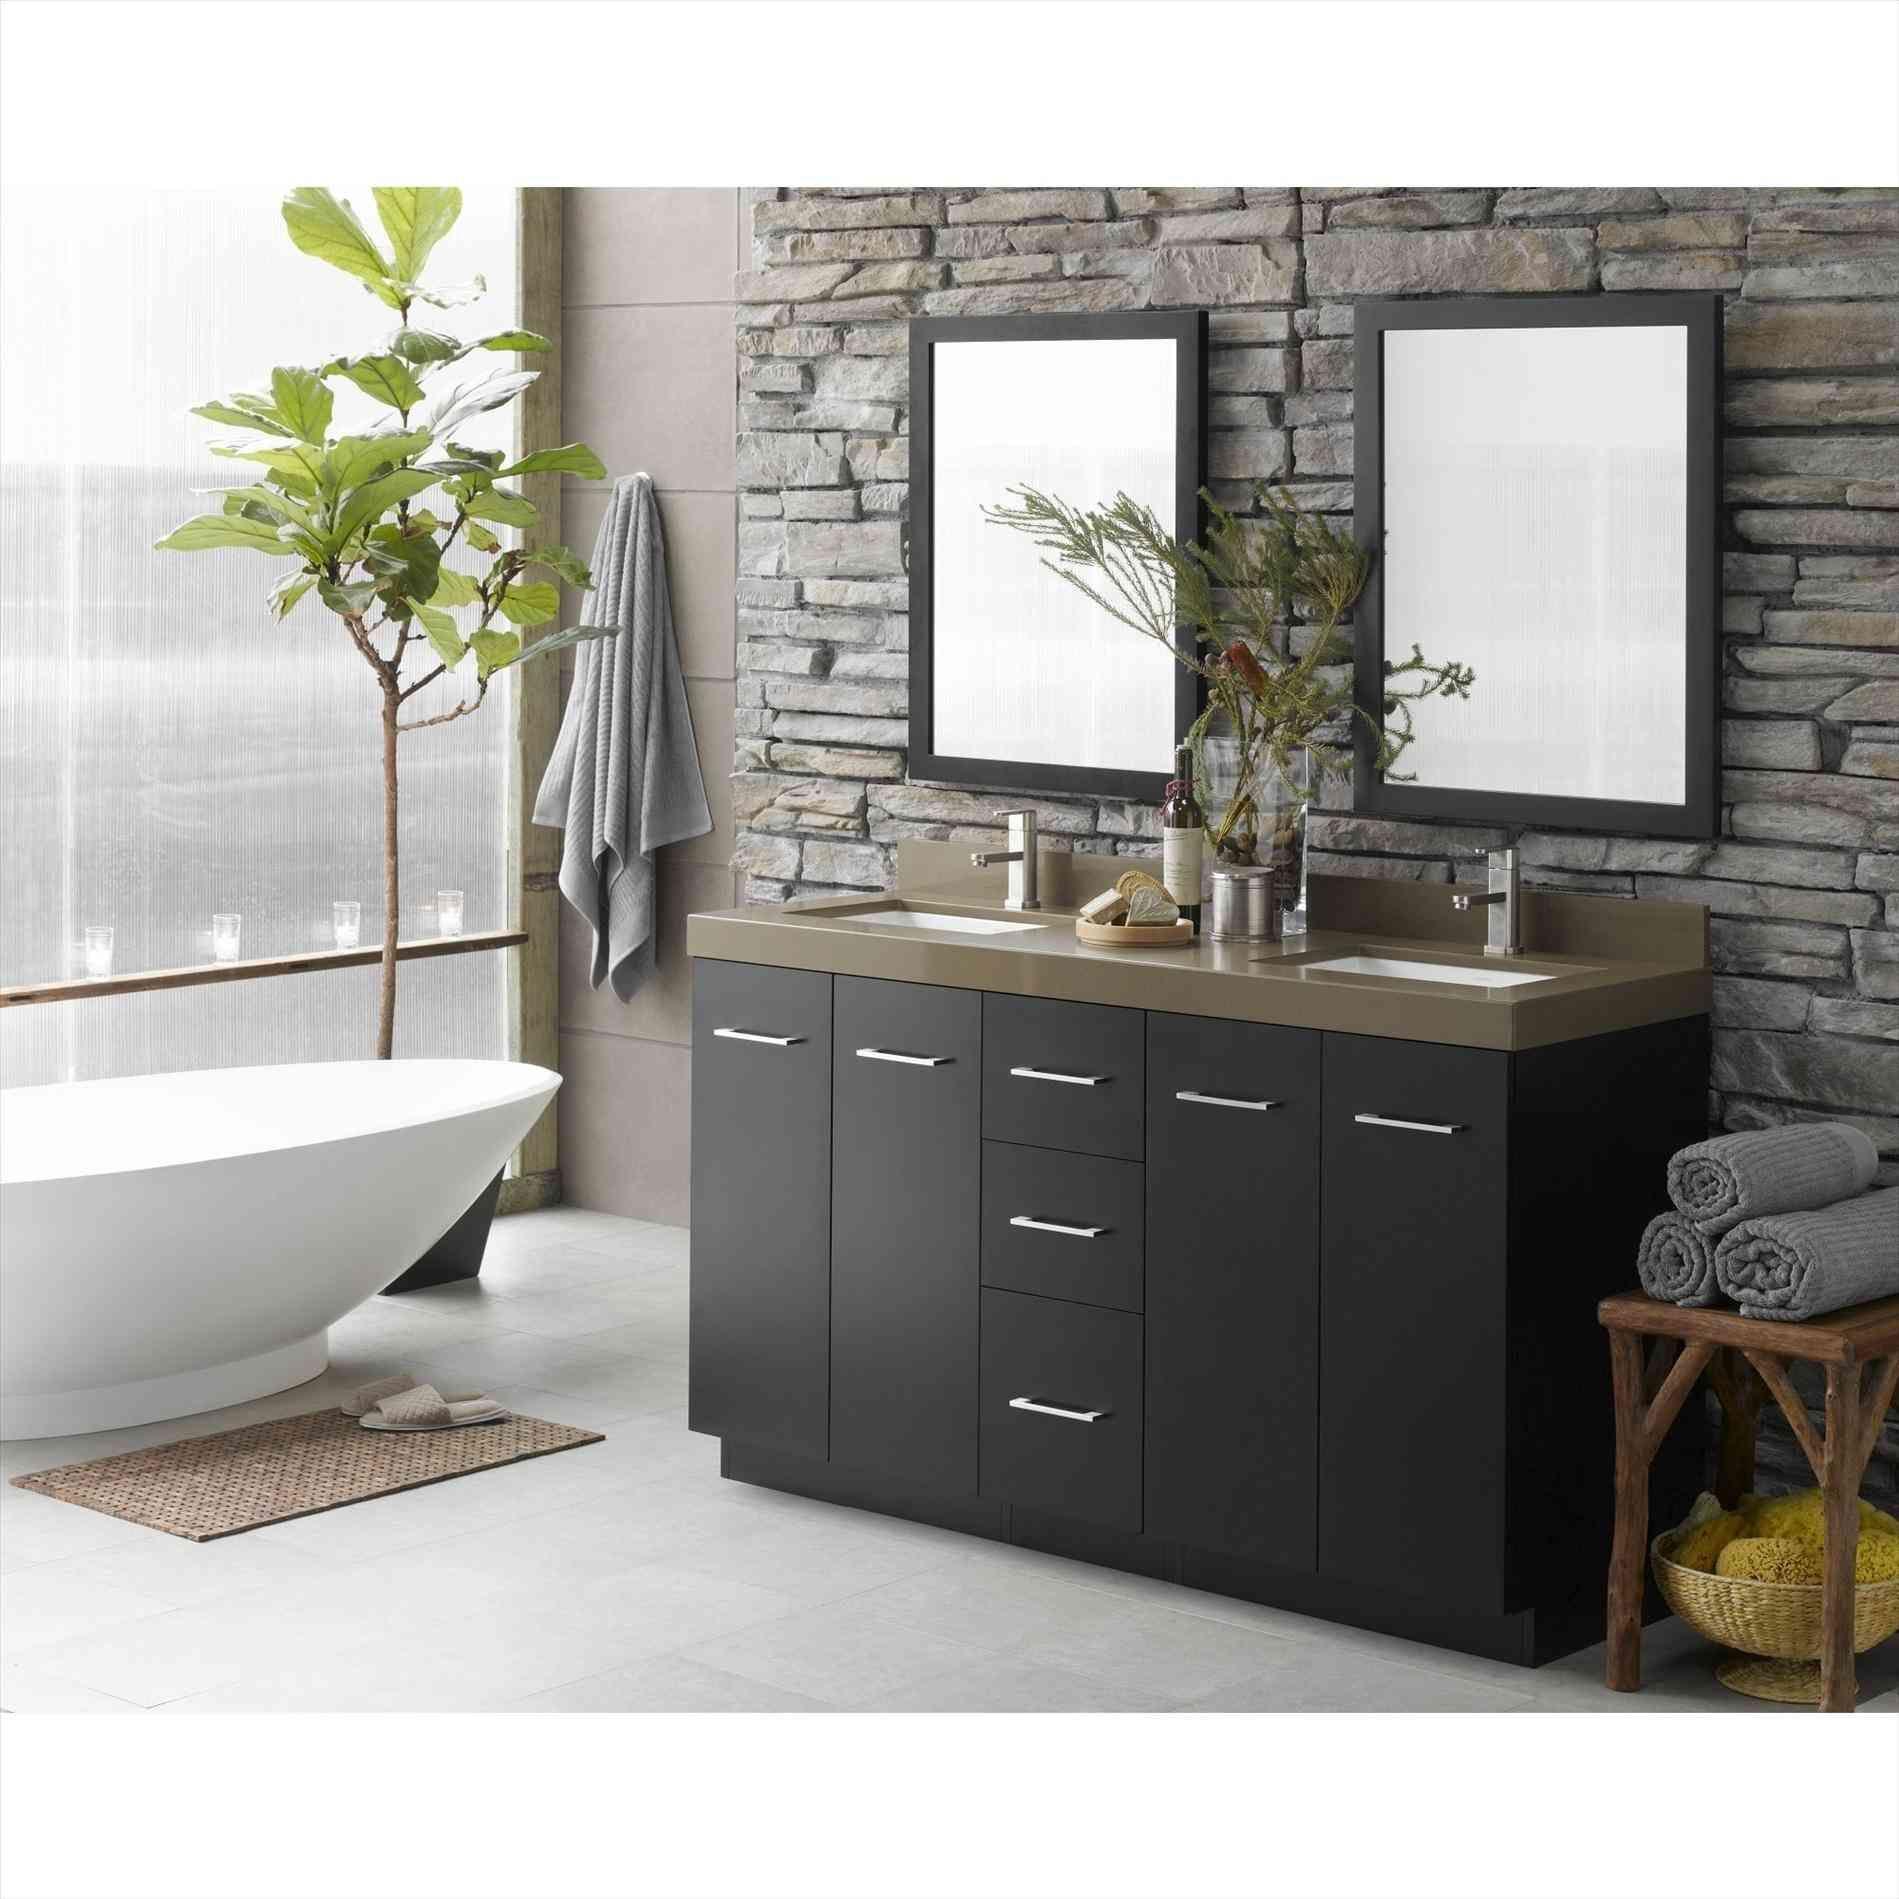 New Post eco friendly bathroom vanity | Bathroom_Ideas | Pinterest Eco Friendly Bathroom Vanity on recycled bathroom vanity, extra long bathroom vanity, ada compliant bathroom vanity, upcycled bathroom vanity,